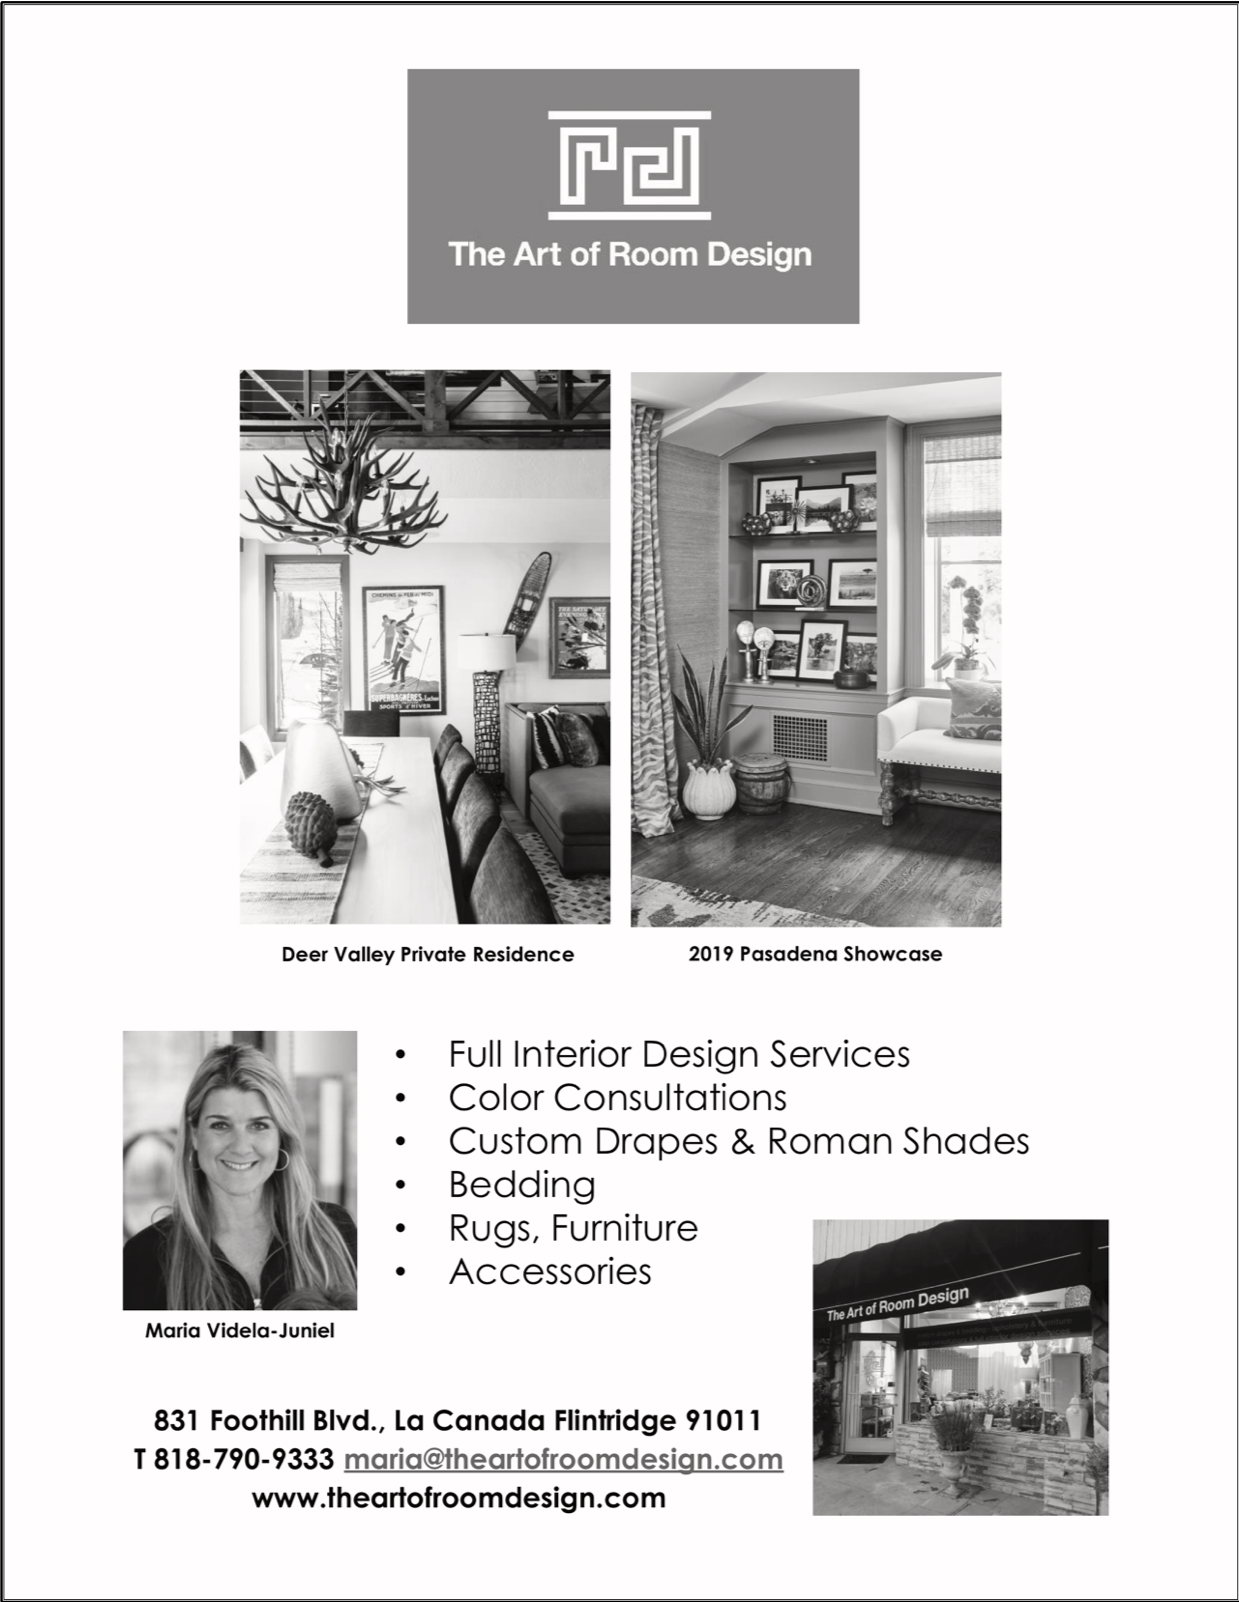 The Art of Room Design